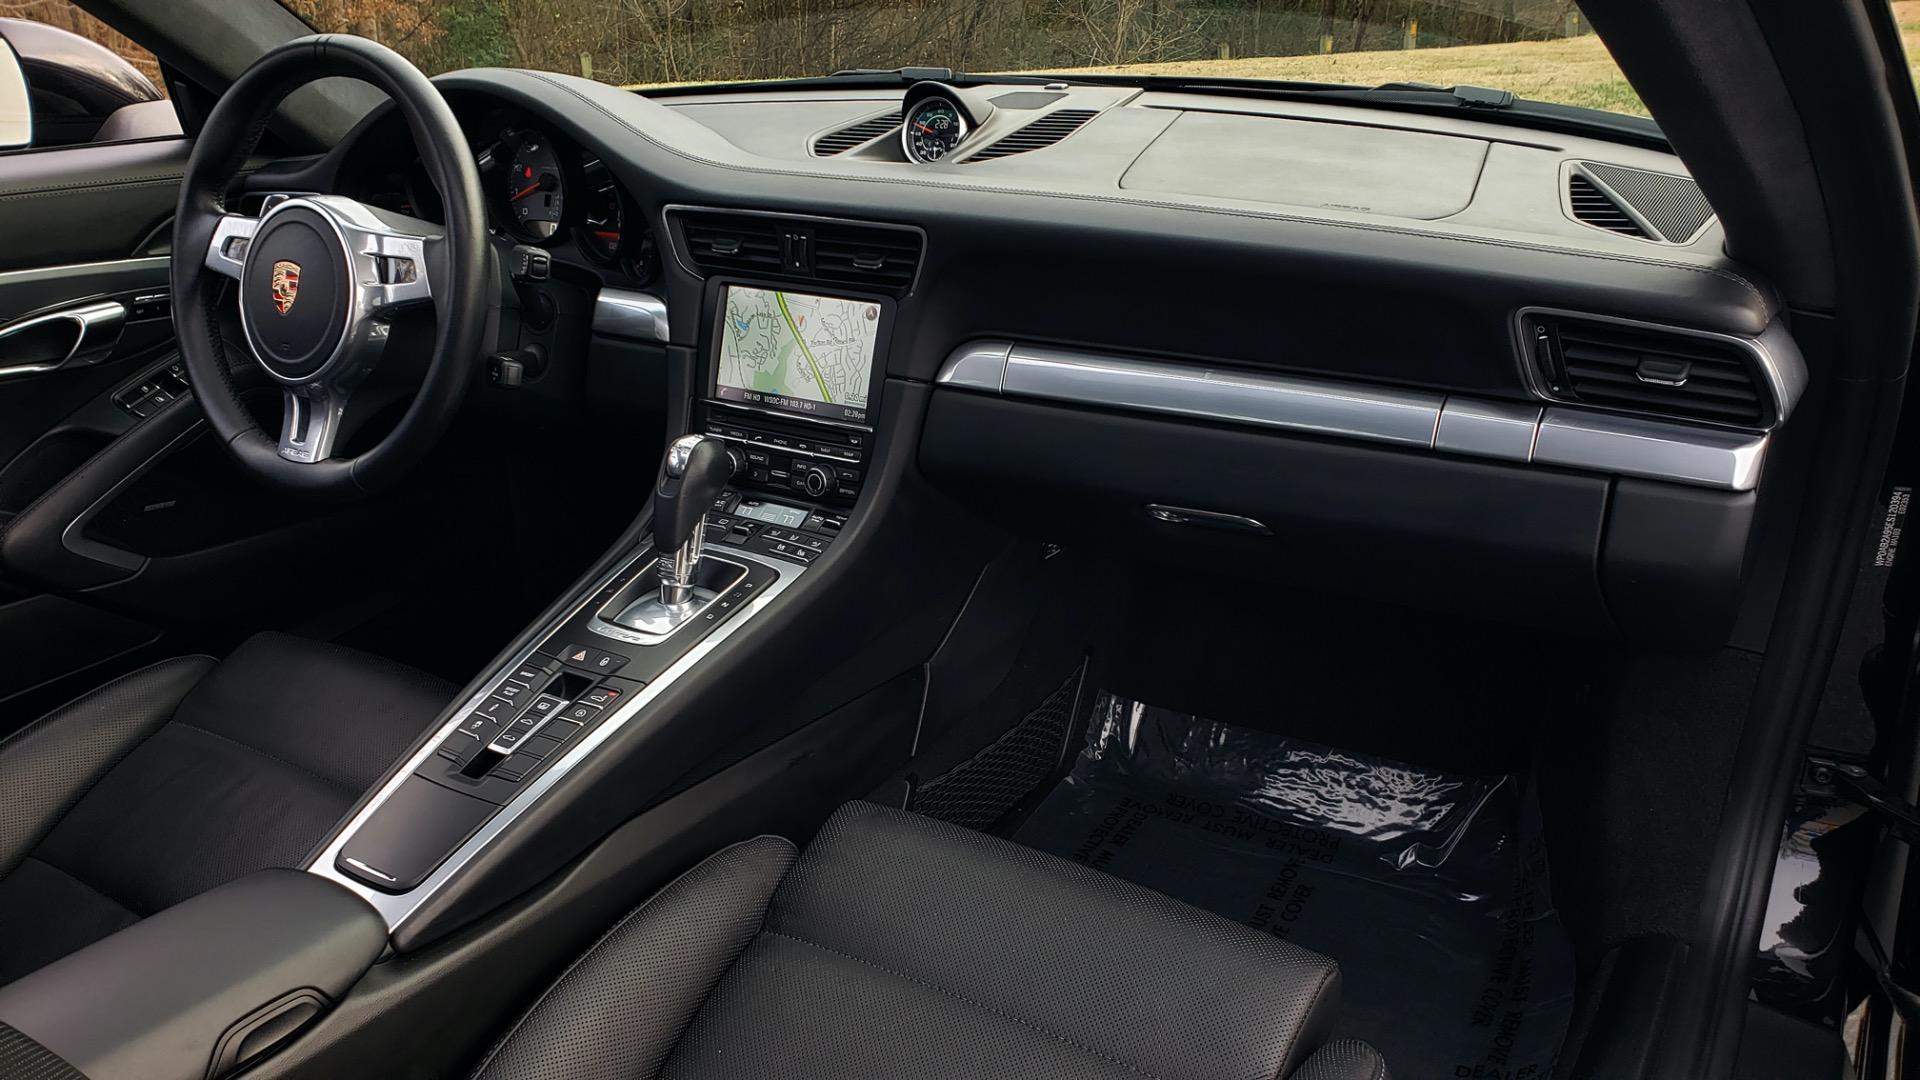 Used 2014 Porsche 911 CARRERA 4S / PREM PKG PLUS / NAV / SUNROO / BOSE / CHRONO for sale Sold at Formula Imports in Charlotte NC 28227 69